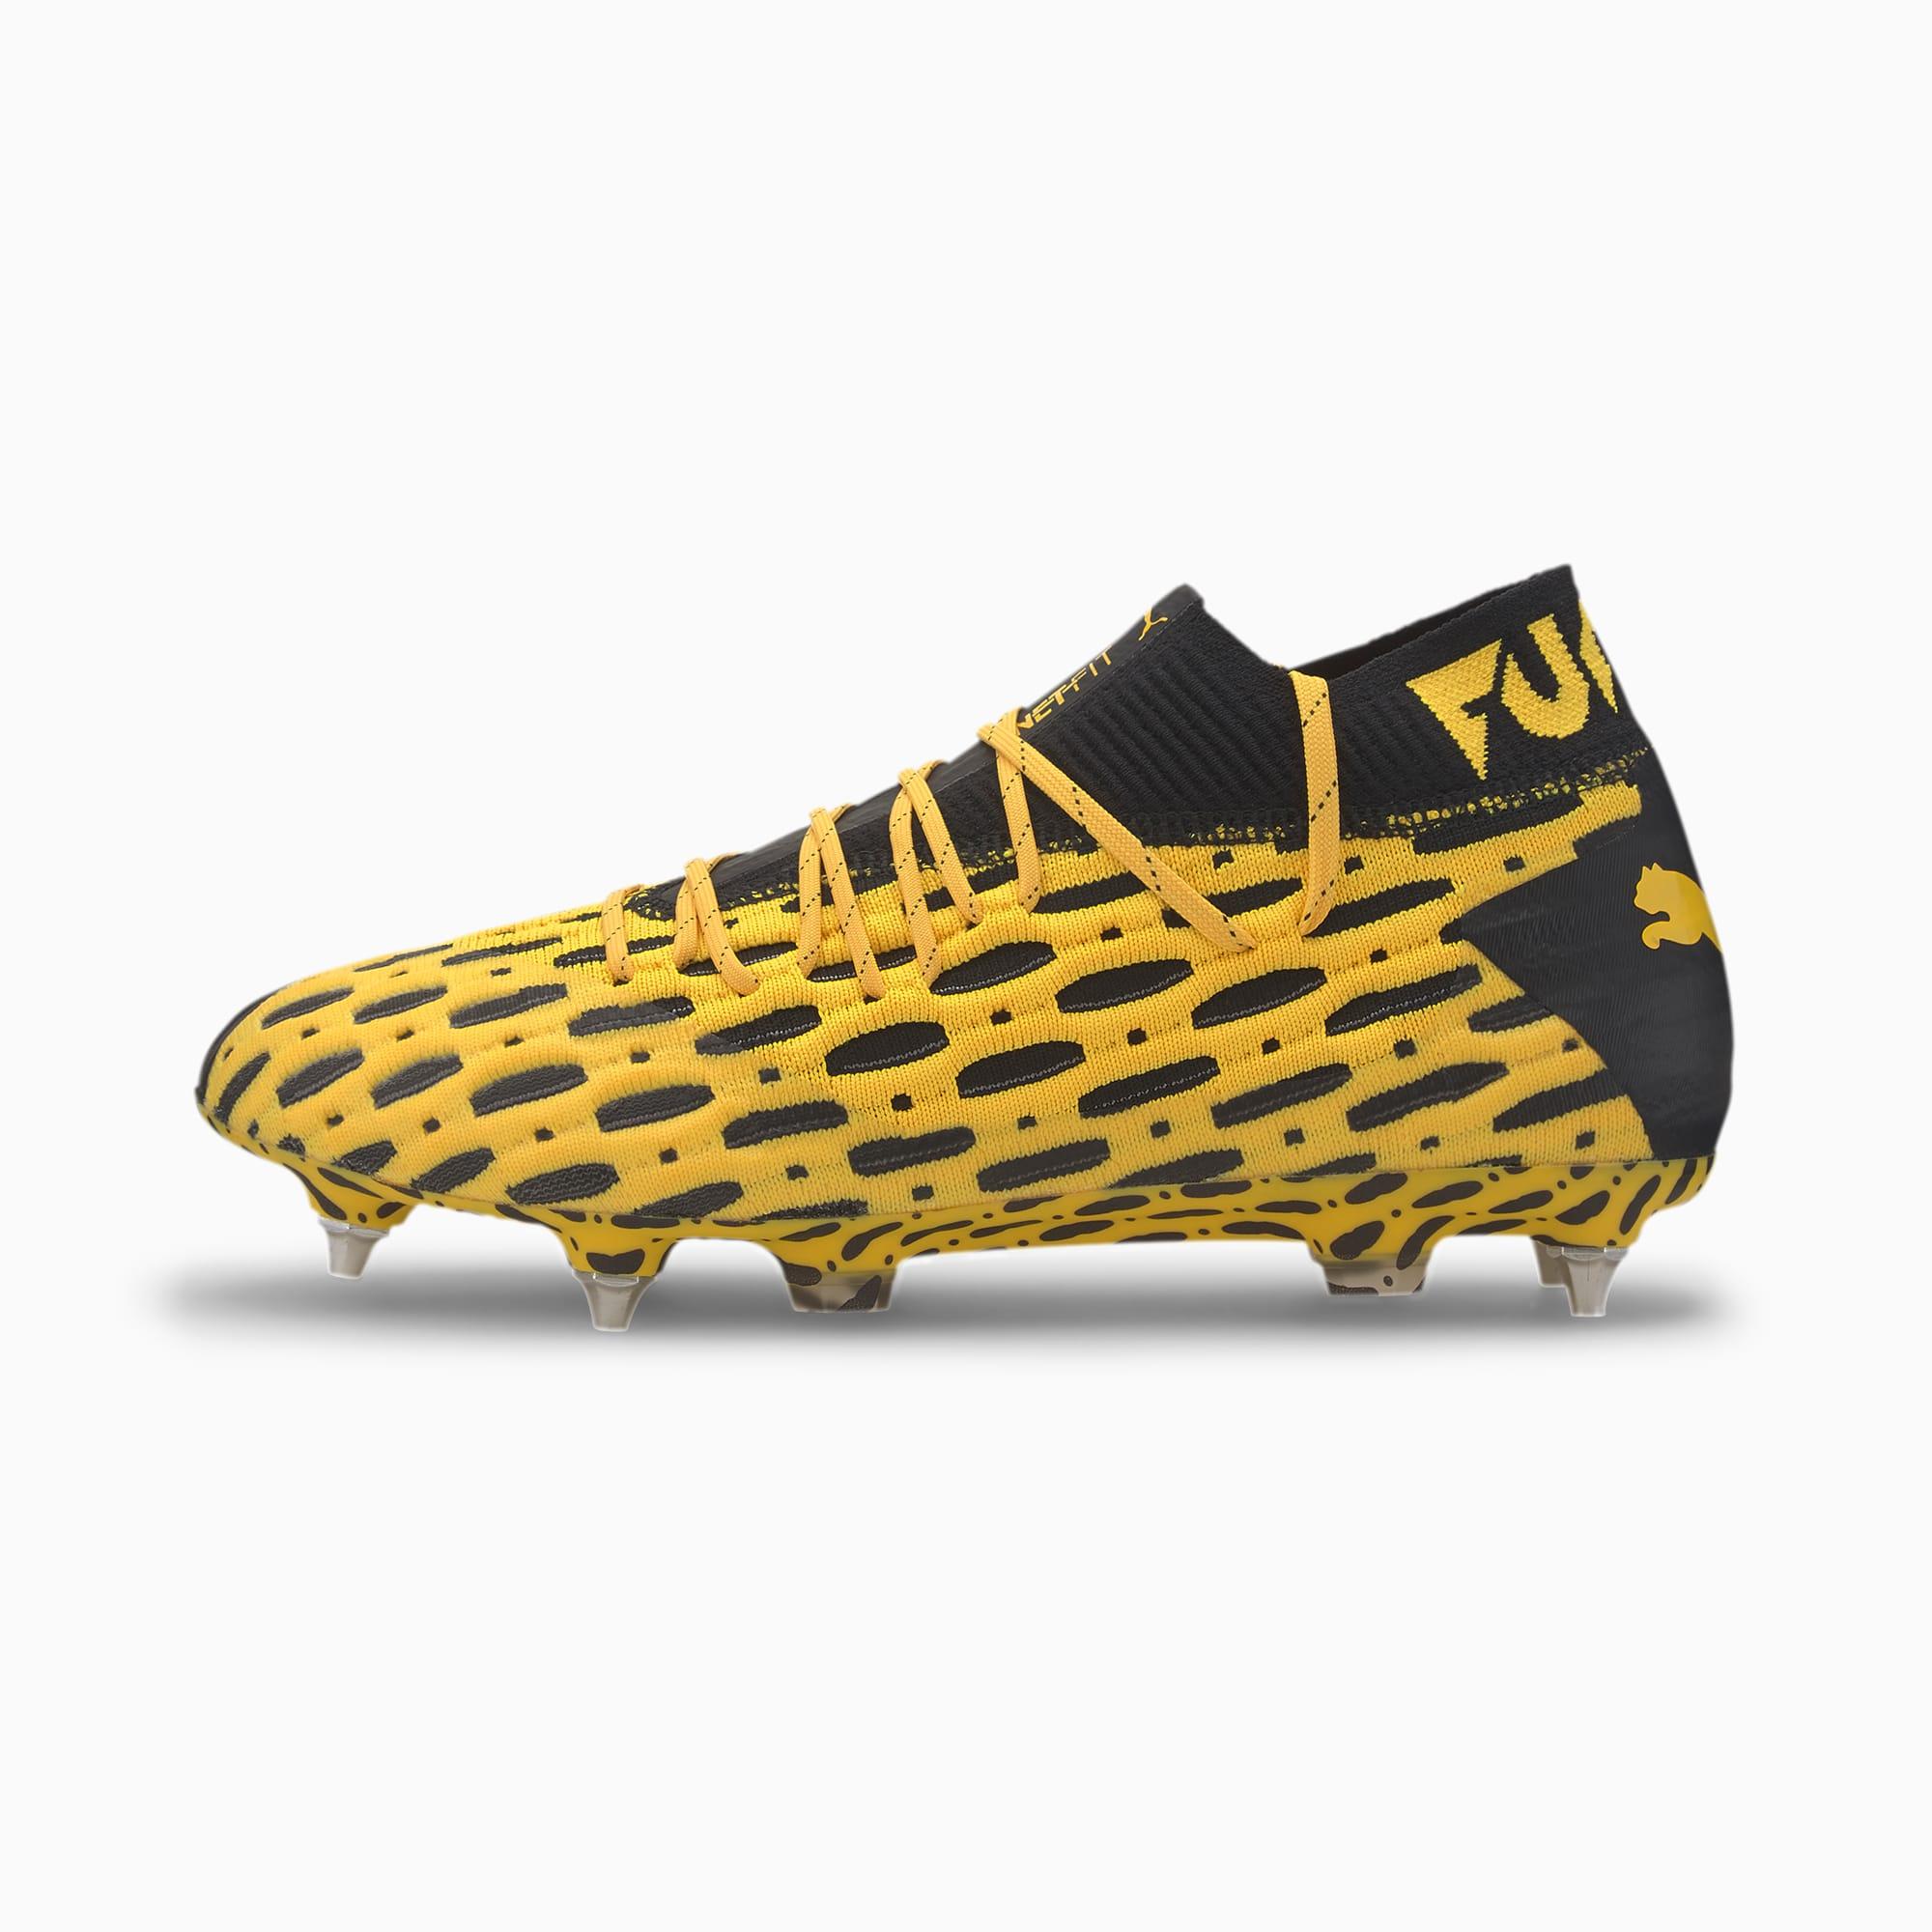 FUTURE 5.1 NETFIT MxSG voetbalschoenen, Zwart/Geel/Aucun, Maat 37,5 | PUMA